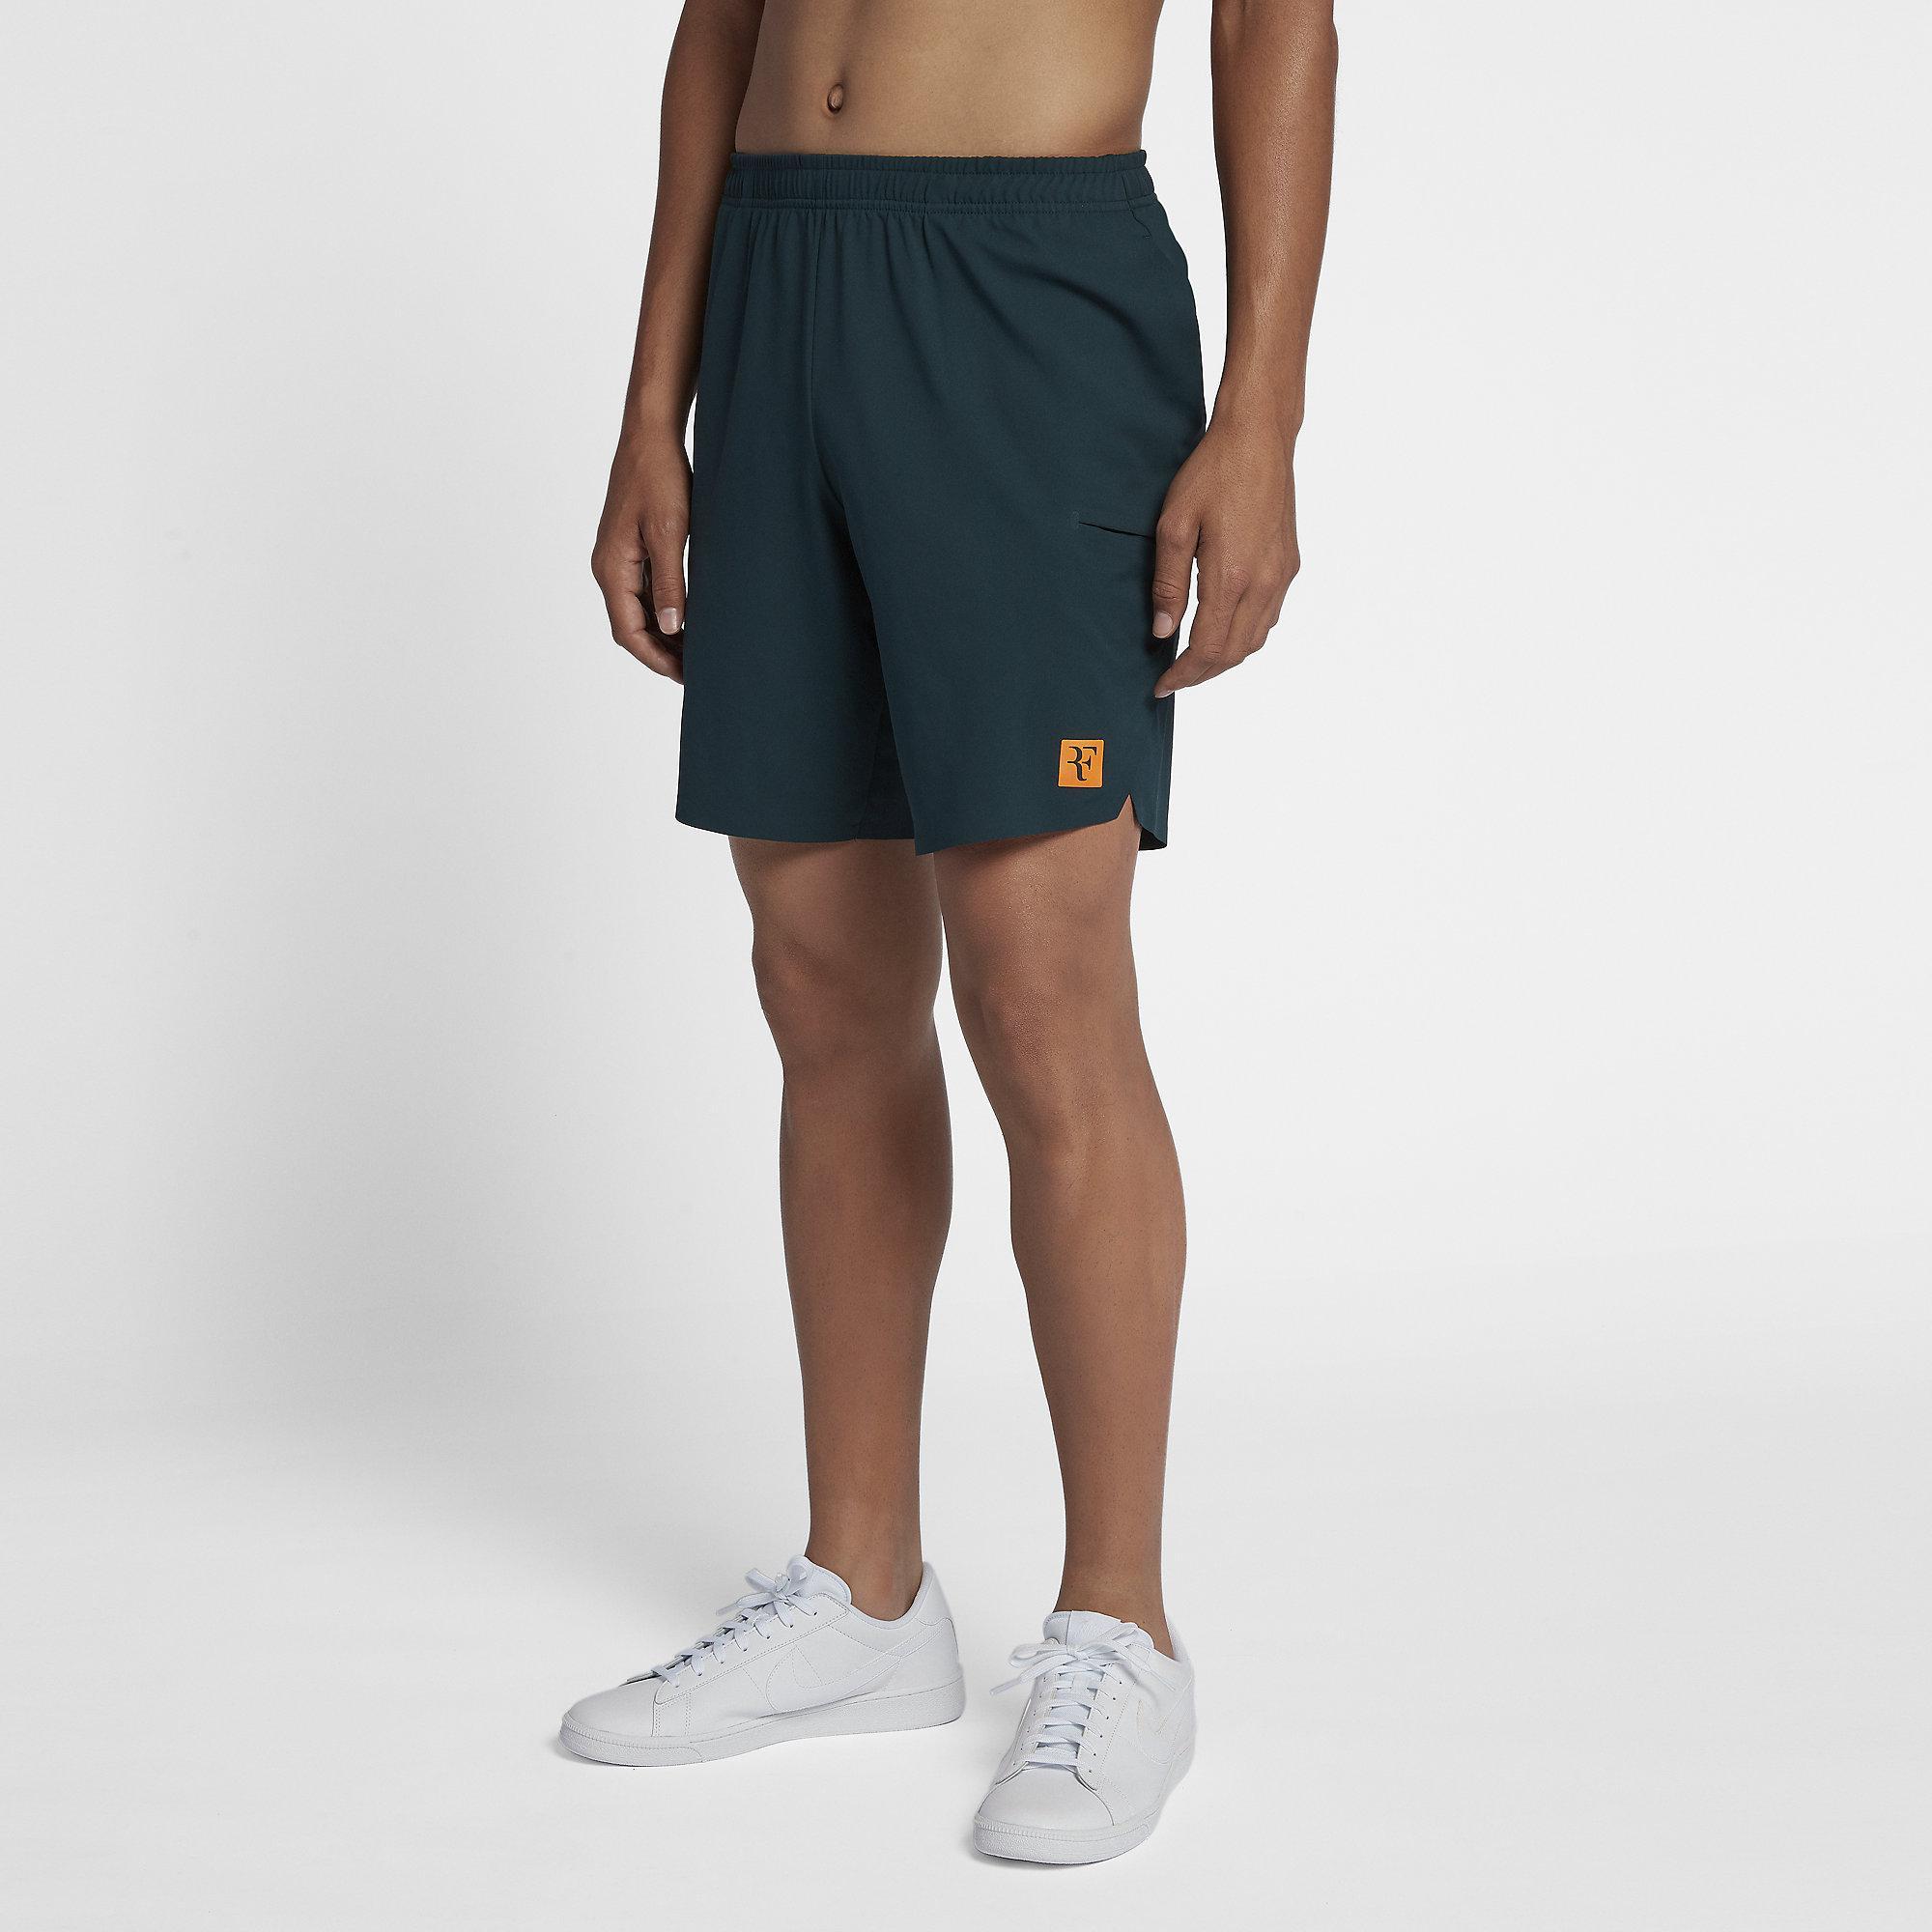 Ace Spruce Rf Nike Midnight Mens Dri Fit Flex Shorts Tennis drshxQCt